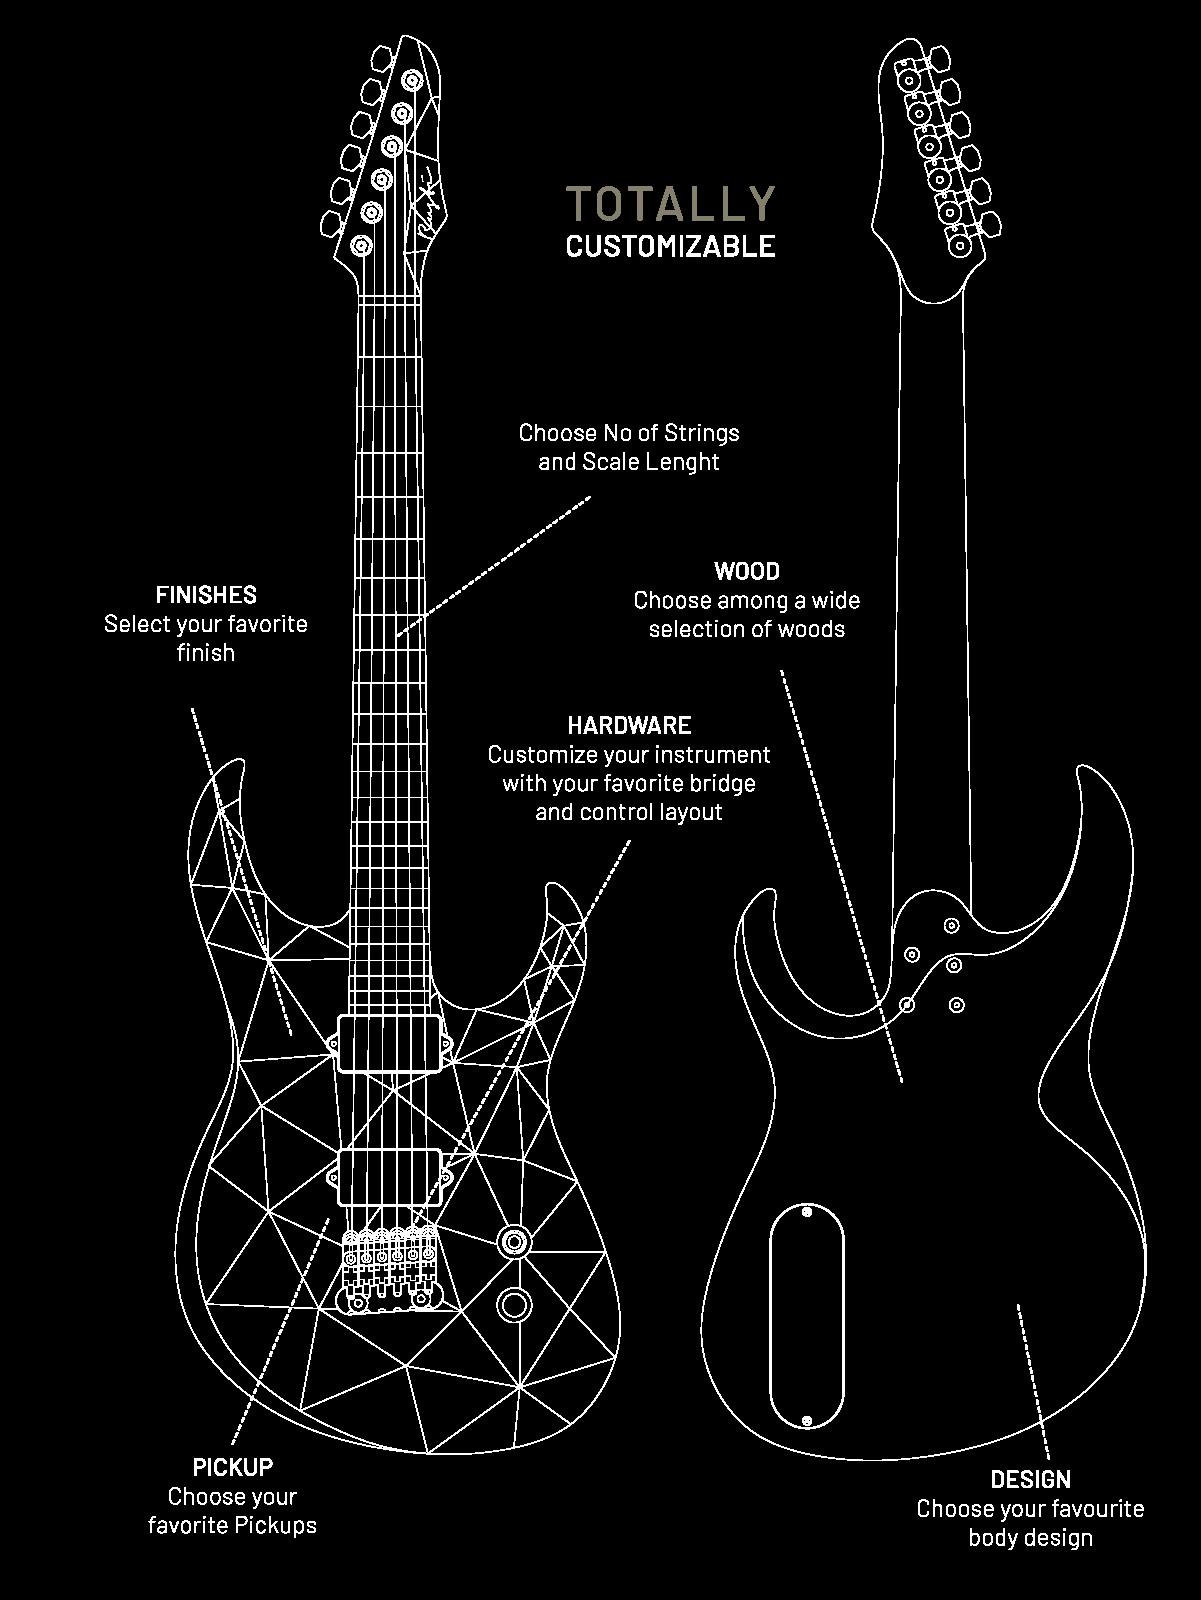 rustiguitars custom guitars abstract project